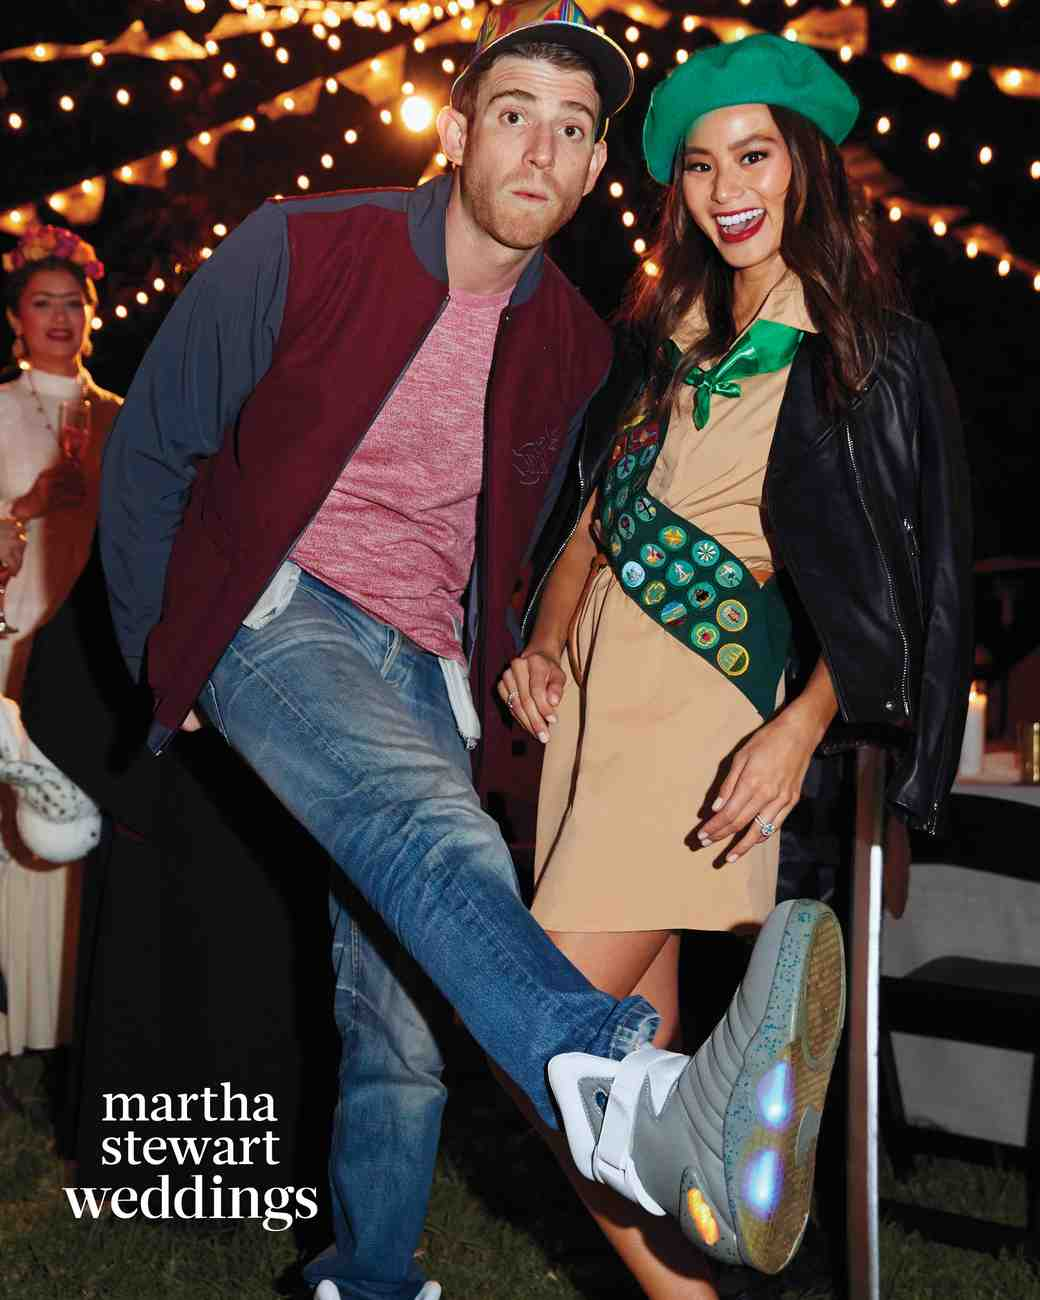 jamie-bryan-wedding-11-costume-party-couple-0640-d112664.jpg